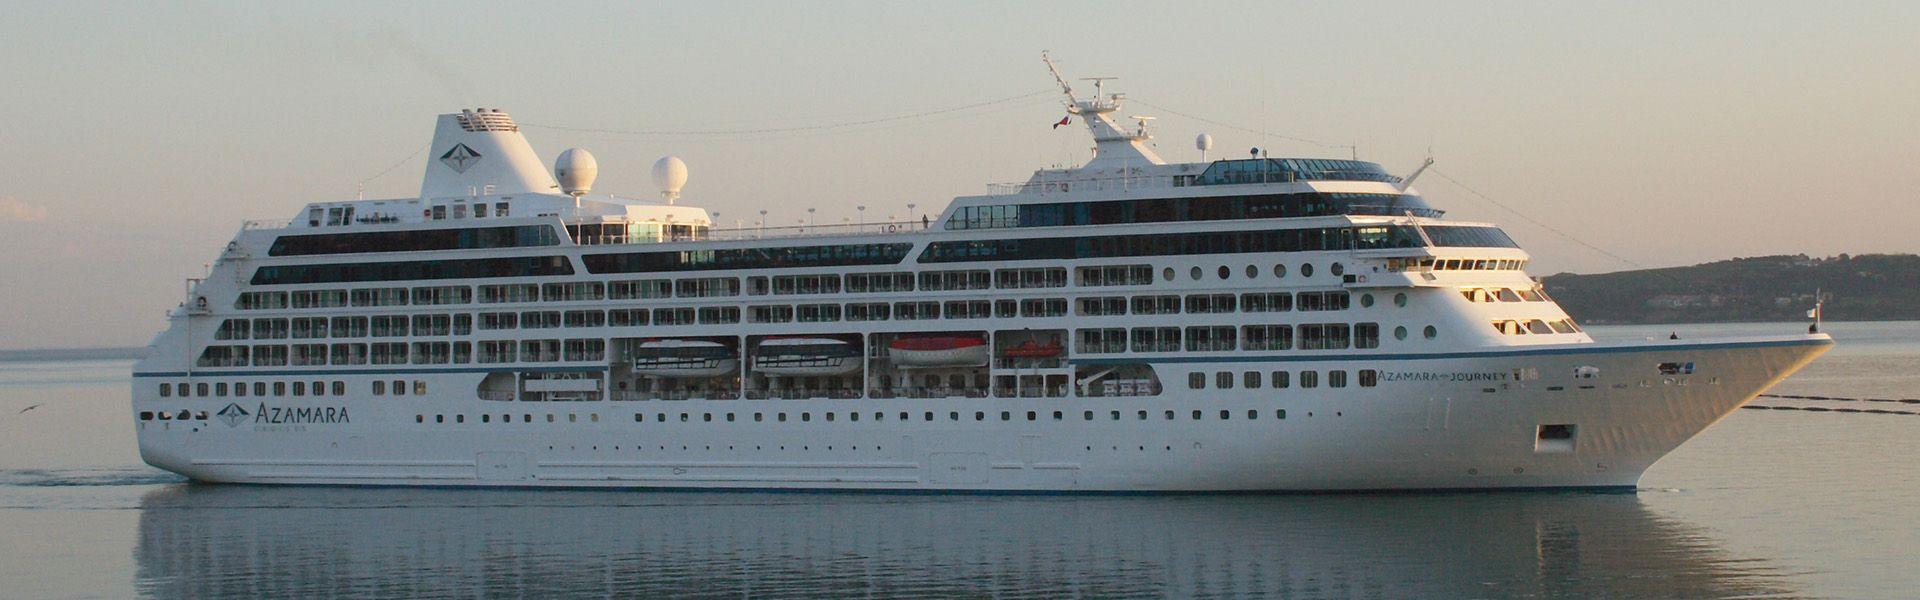 Croaziera 2016 - Asia de Sud(singapore) - Azamara Club Cruises - 14 nopti